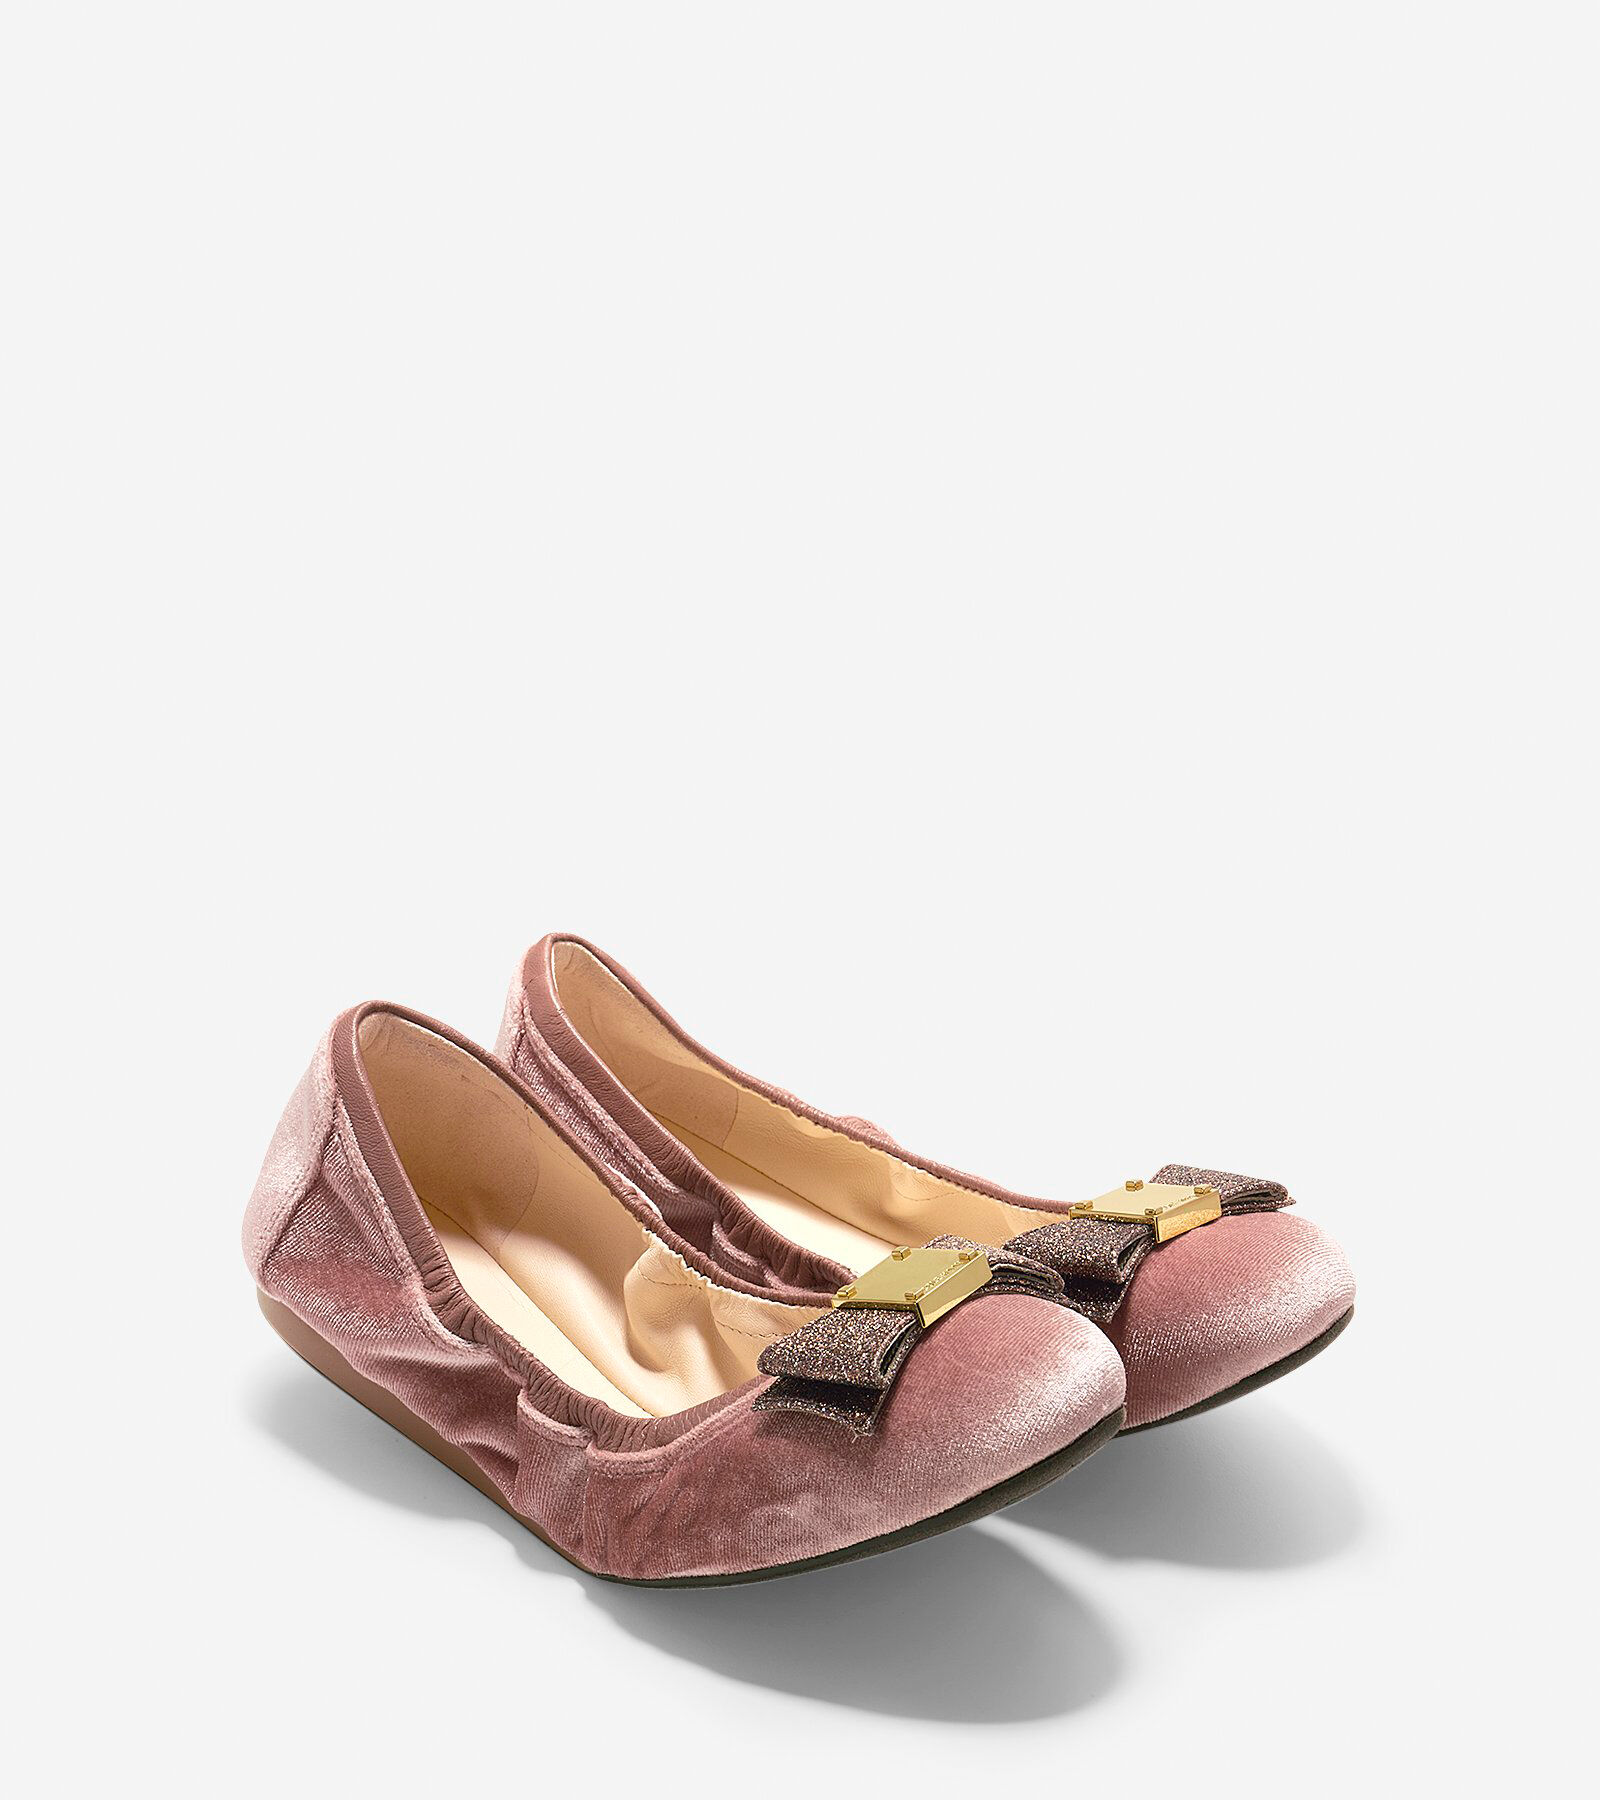 Cole Haan Women's Tali Velvet Bow Ballet Flats IaTxbK4Bx